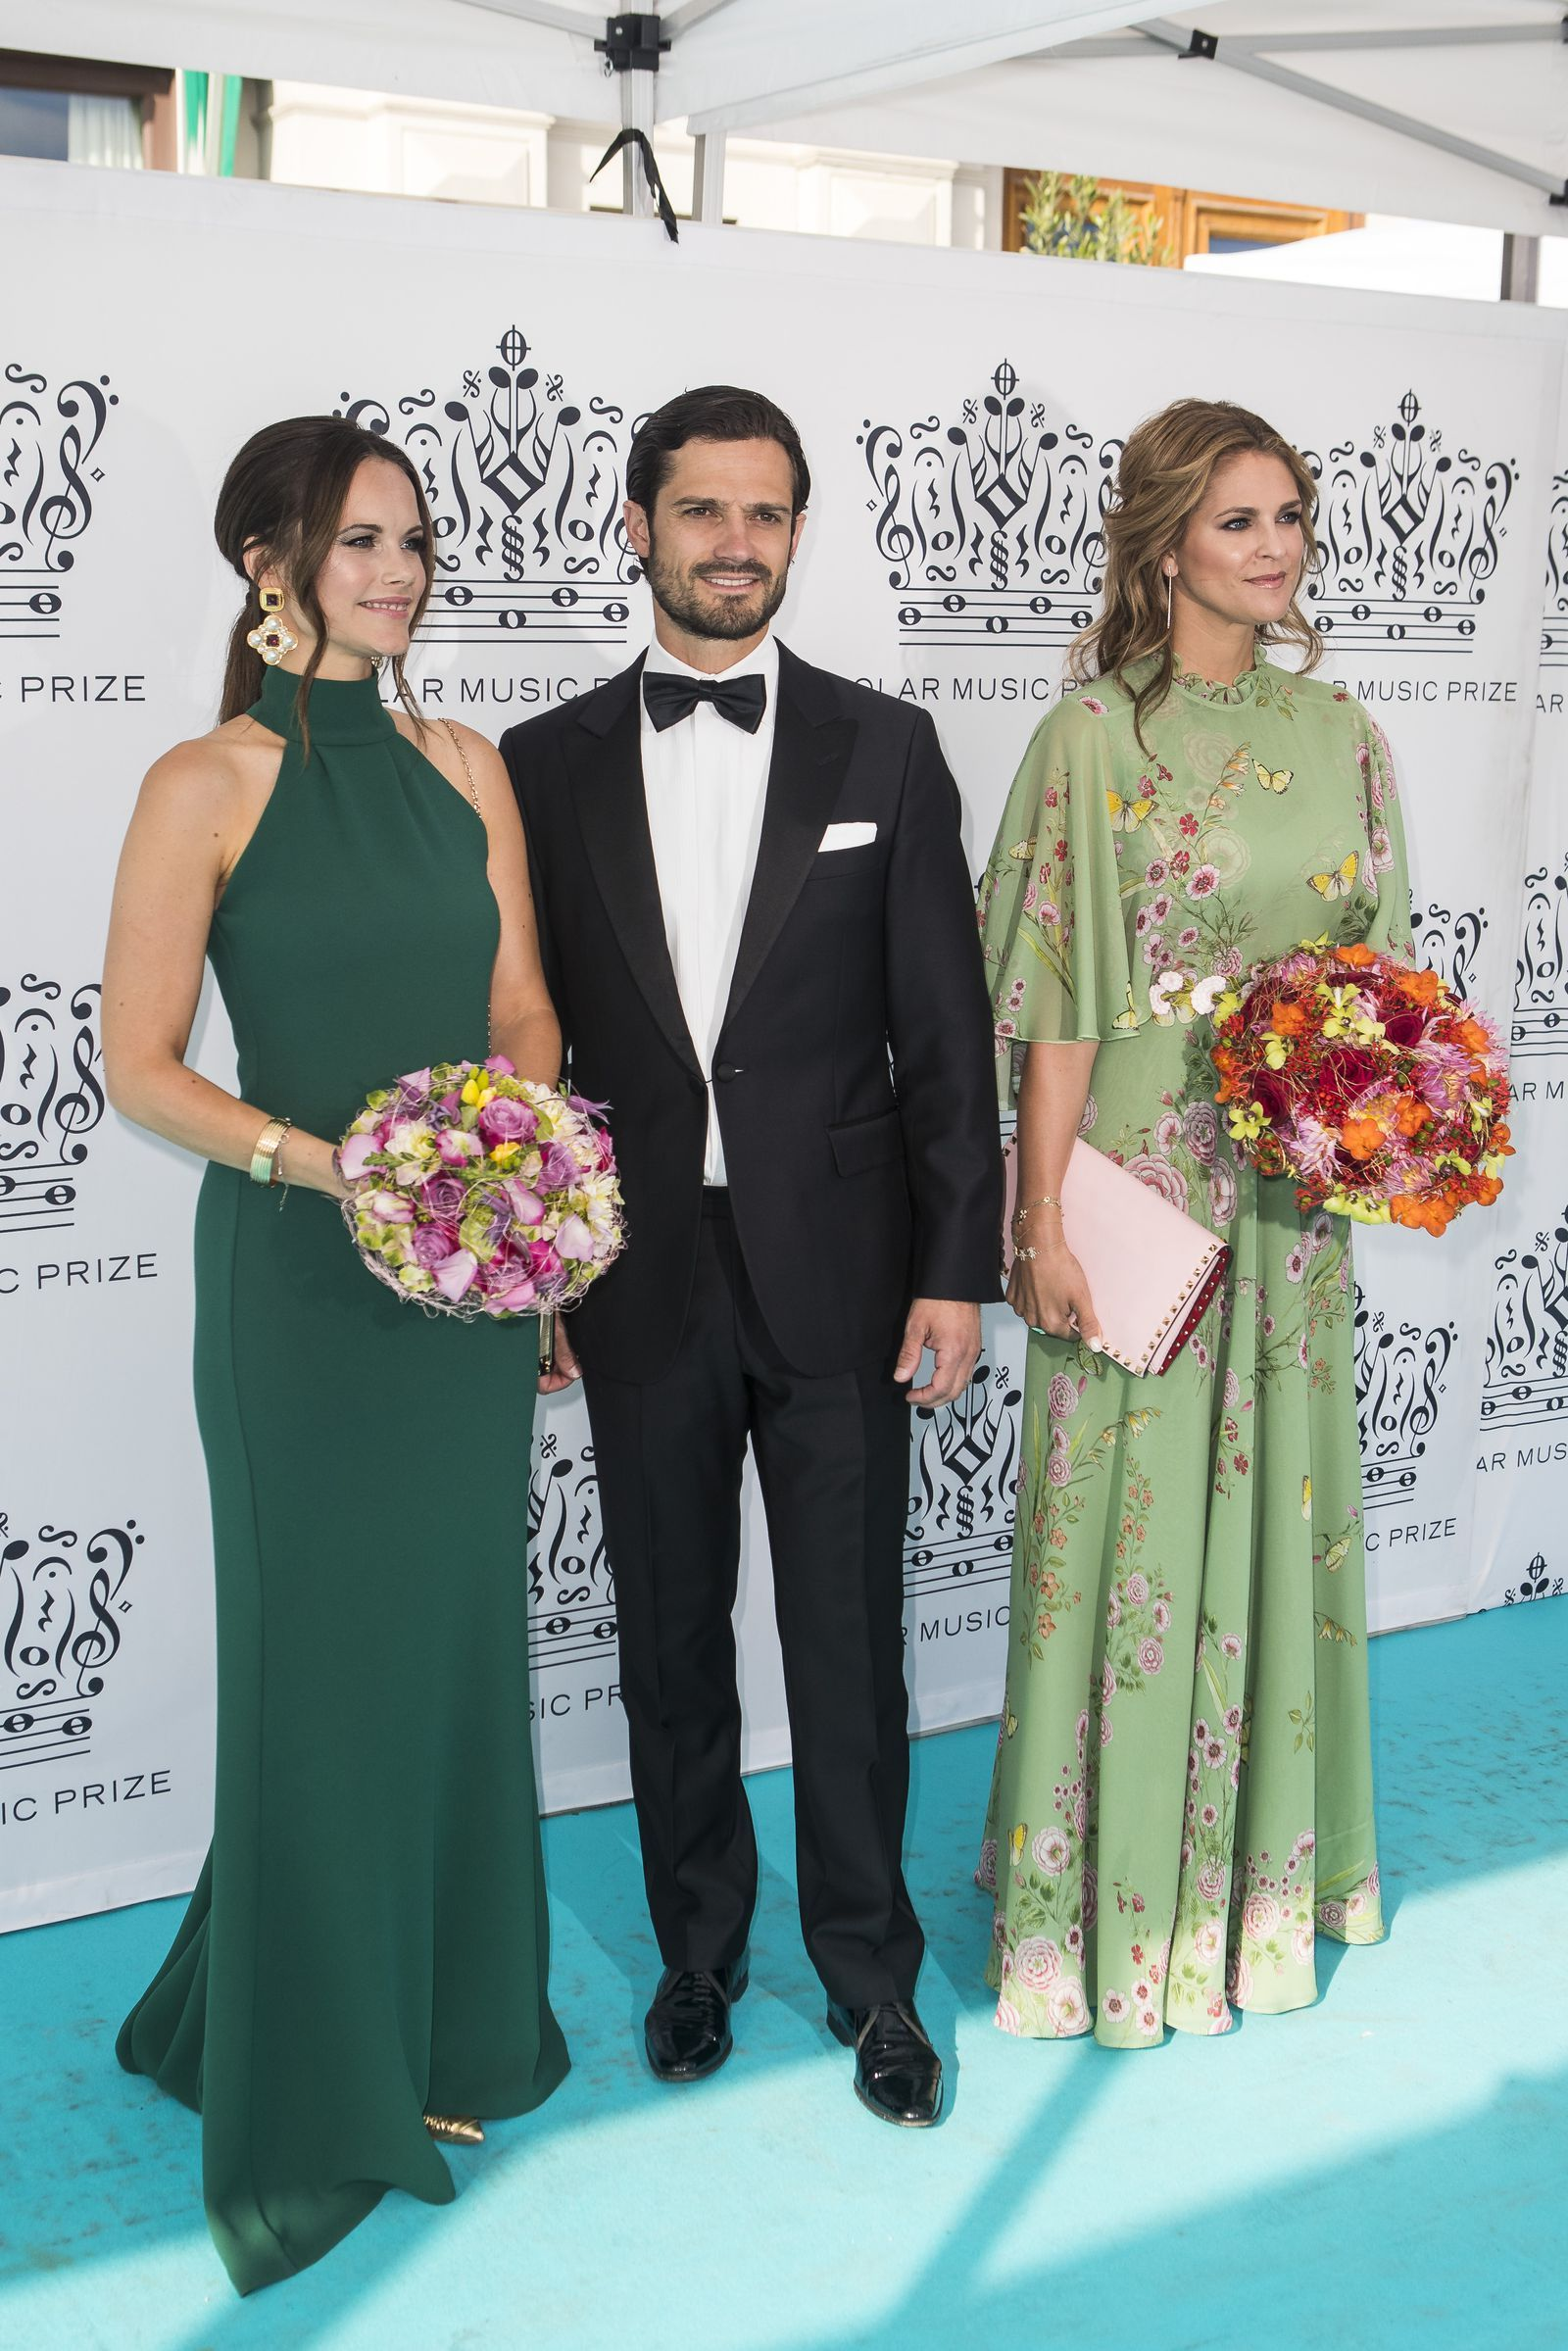 Princess Sofia Wore a Dress Identical to Meghan Markle's